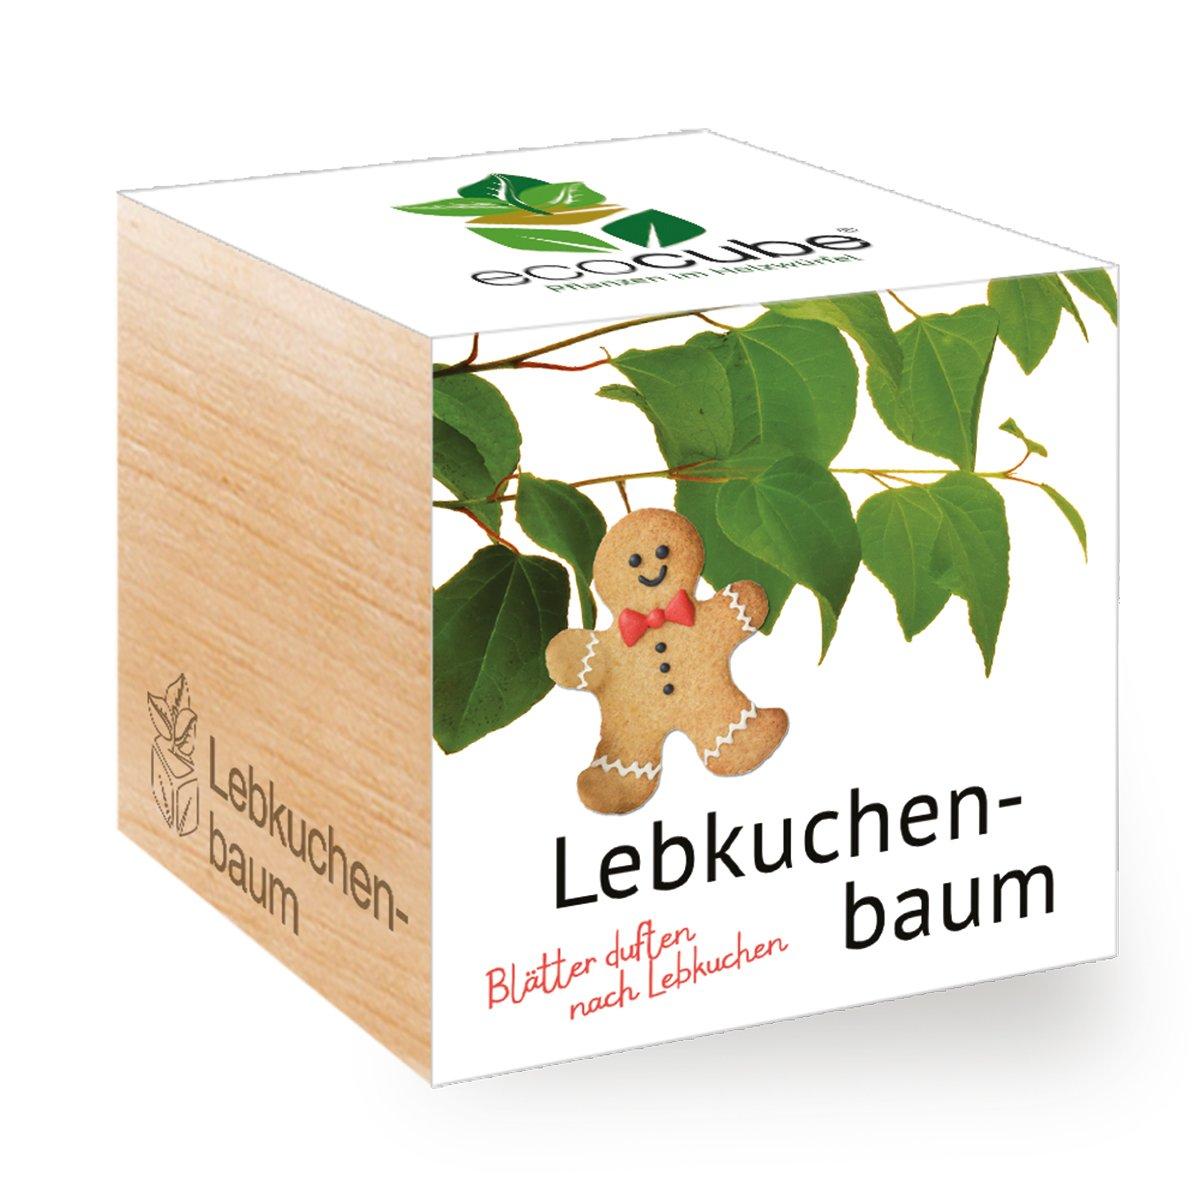 Lebkuchenbaum im Holzwürfel Ecocube